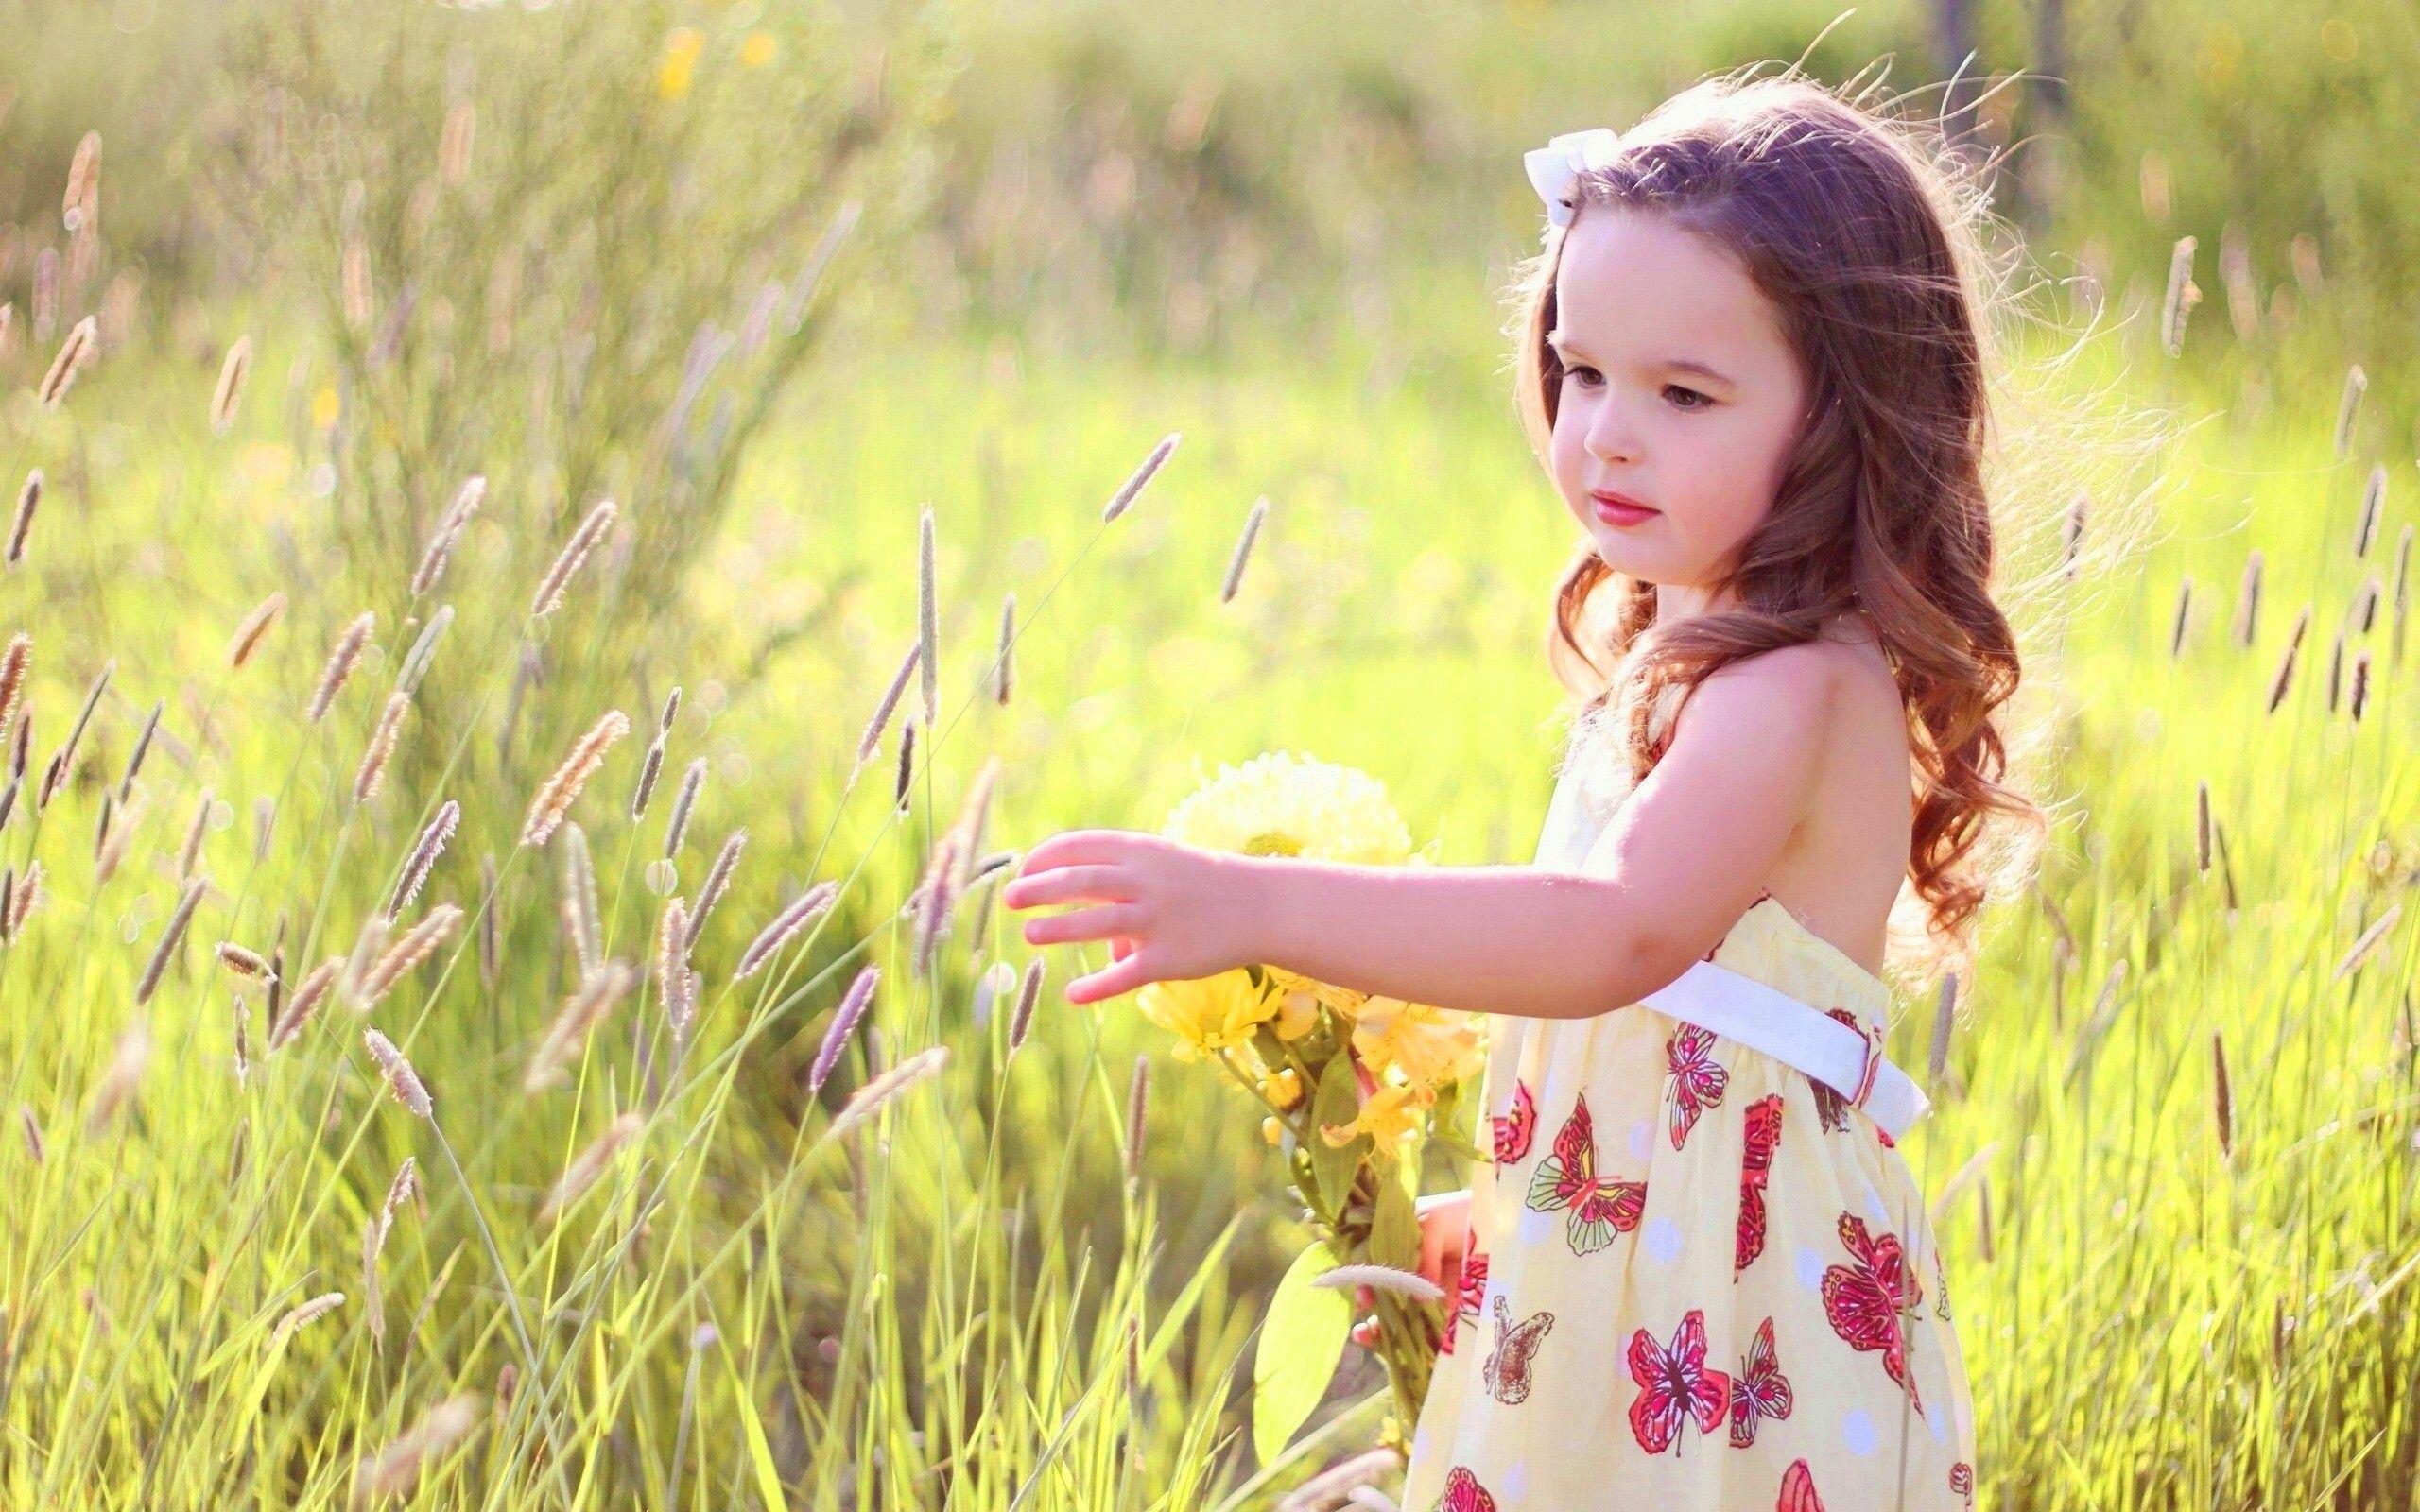 Beautiful girl with flower googleda ara ekler baheler beautiful girl with flower googleda ara izmirmasajfo